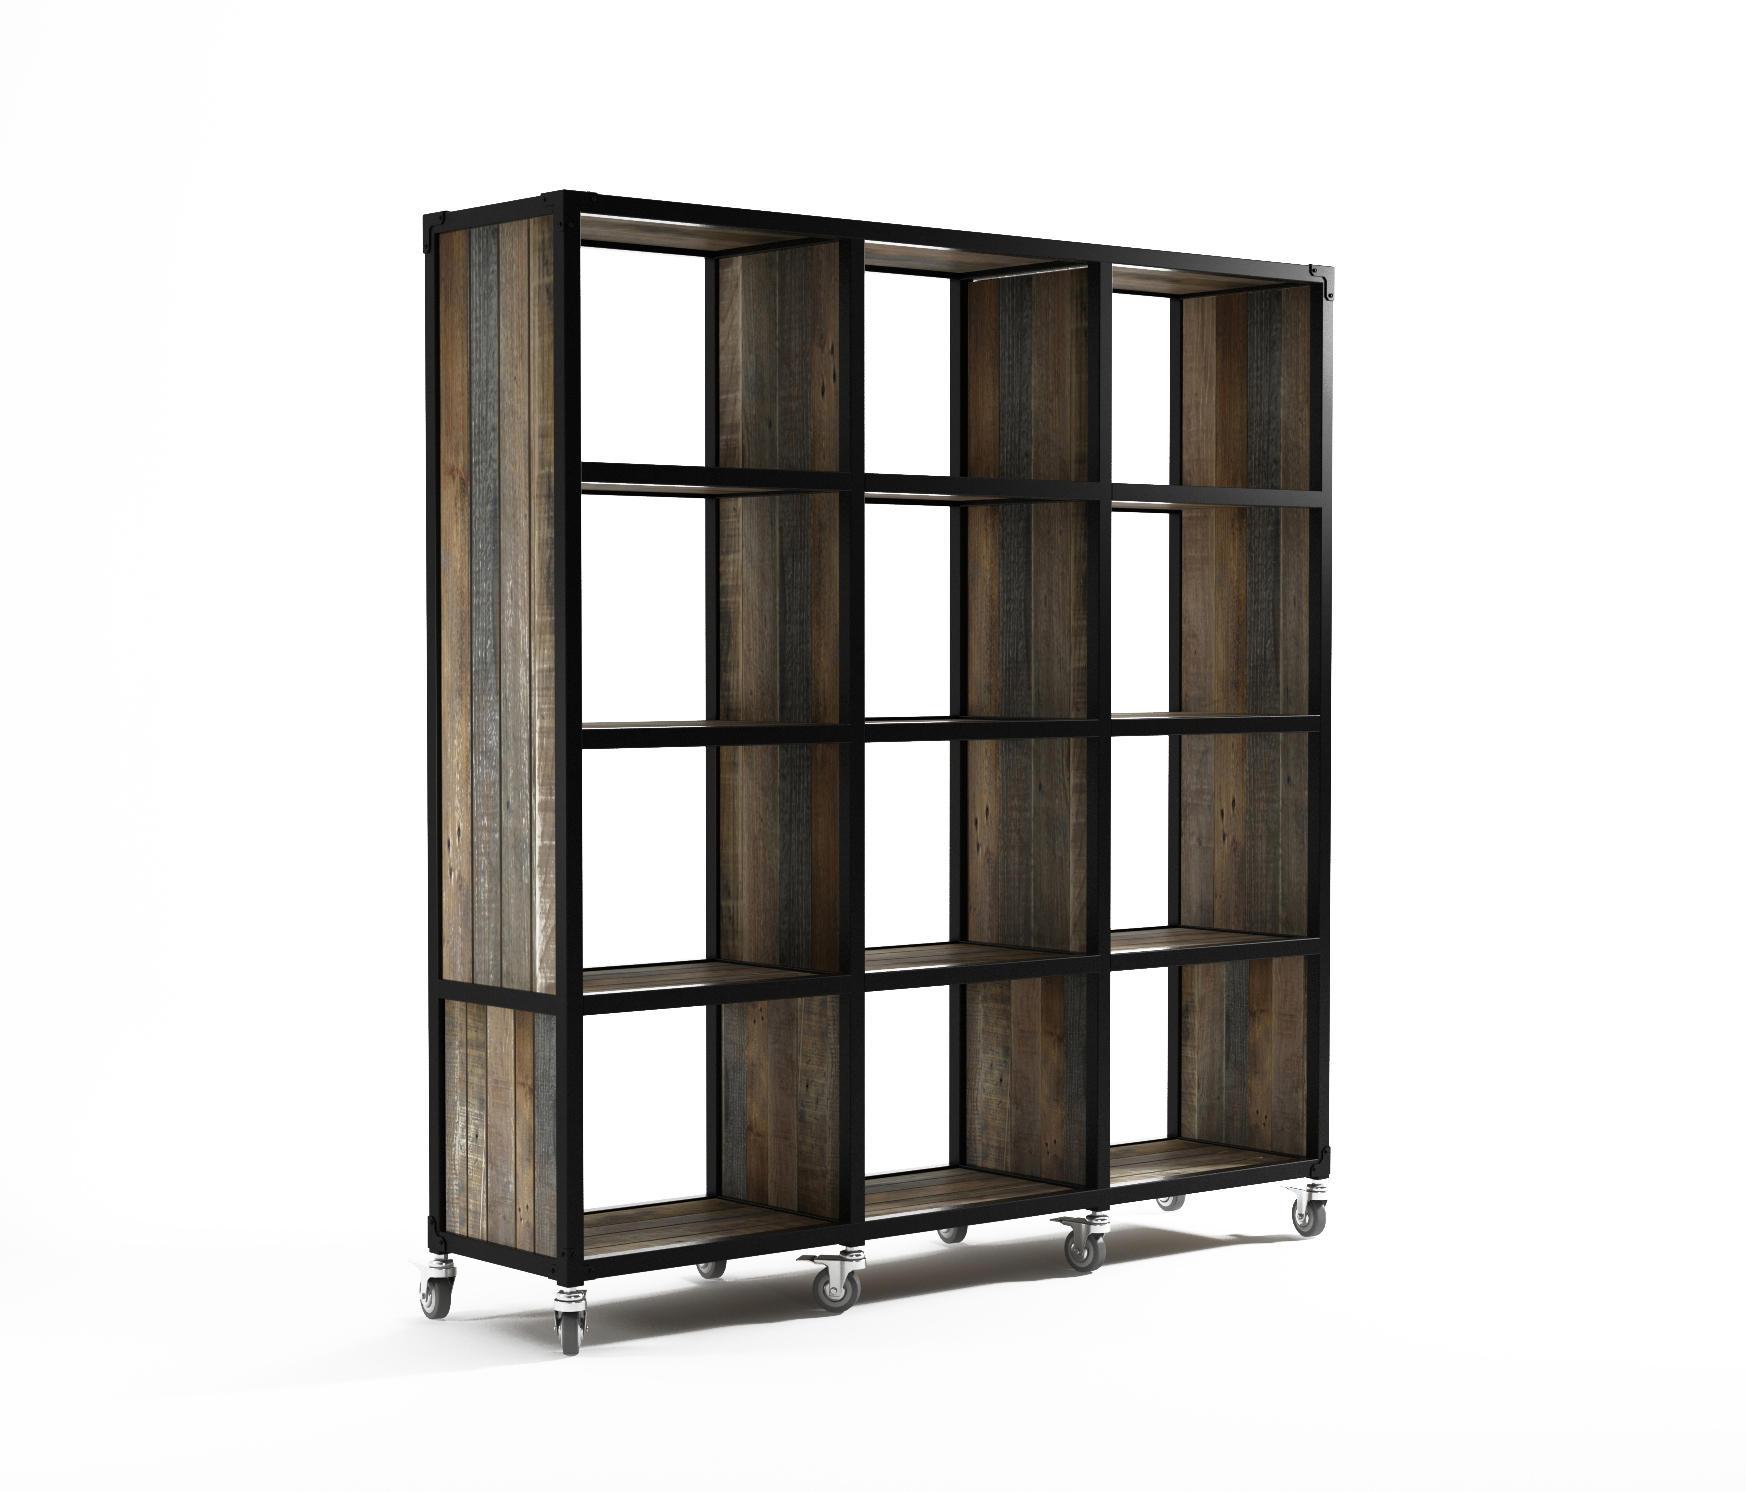 Atelier vertical rack 12 compartments estanter a de for Estanteria vertical